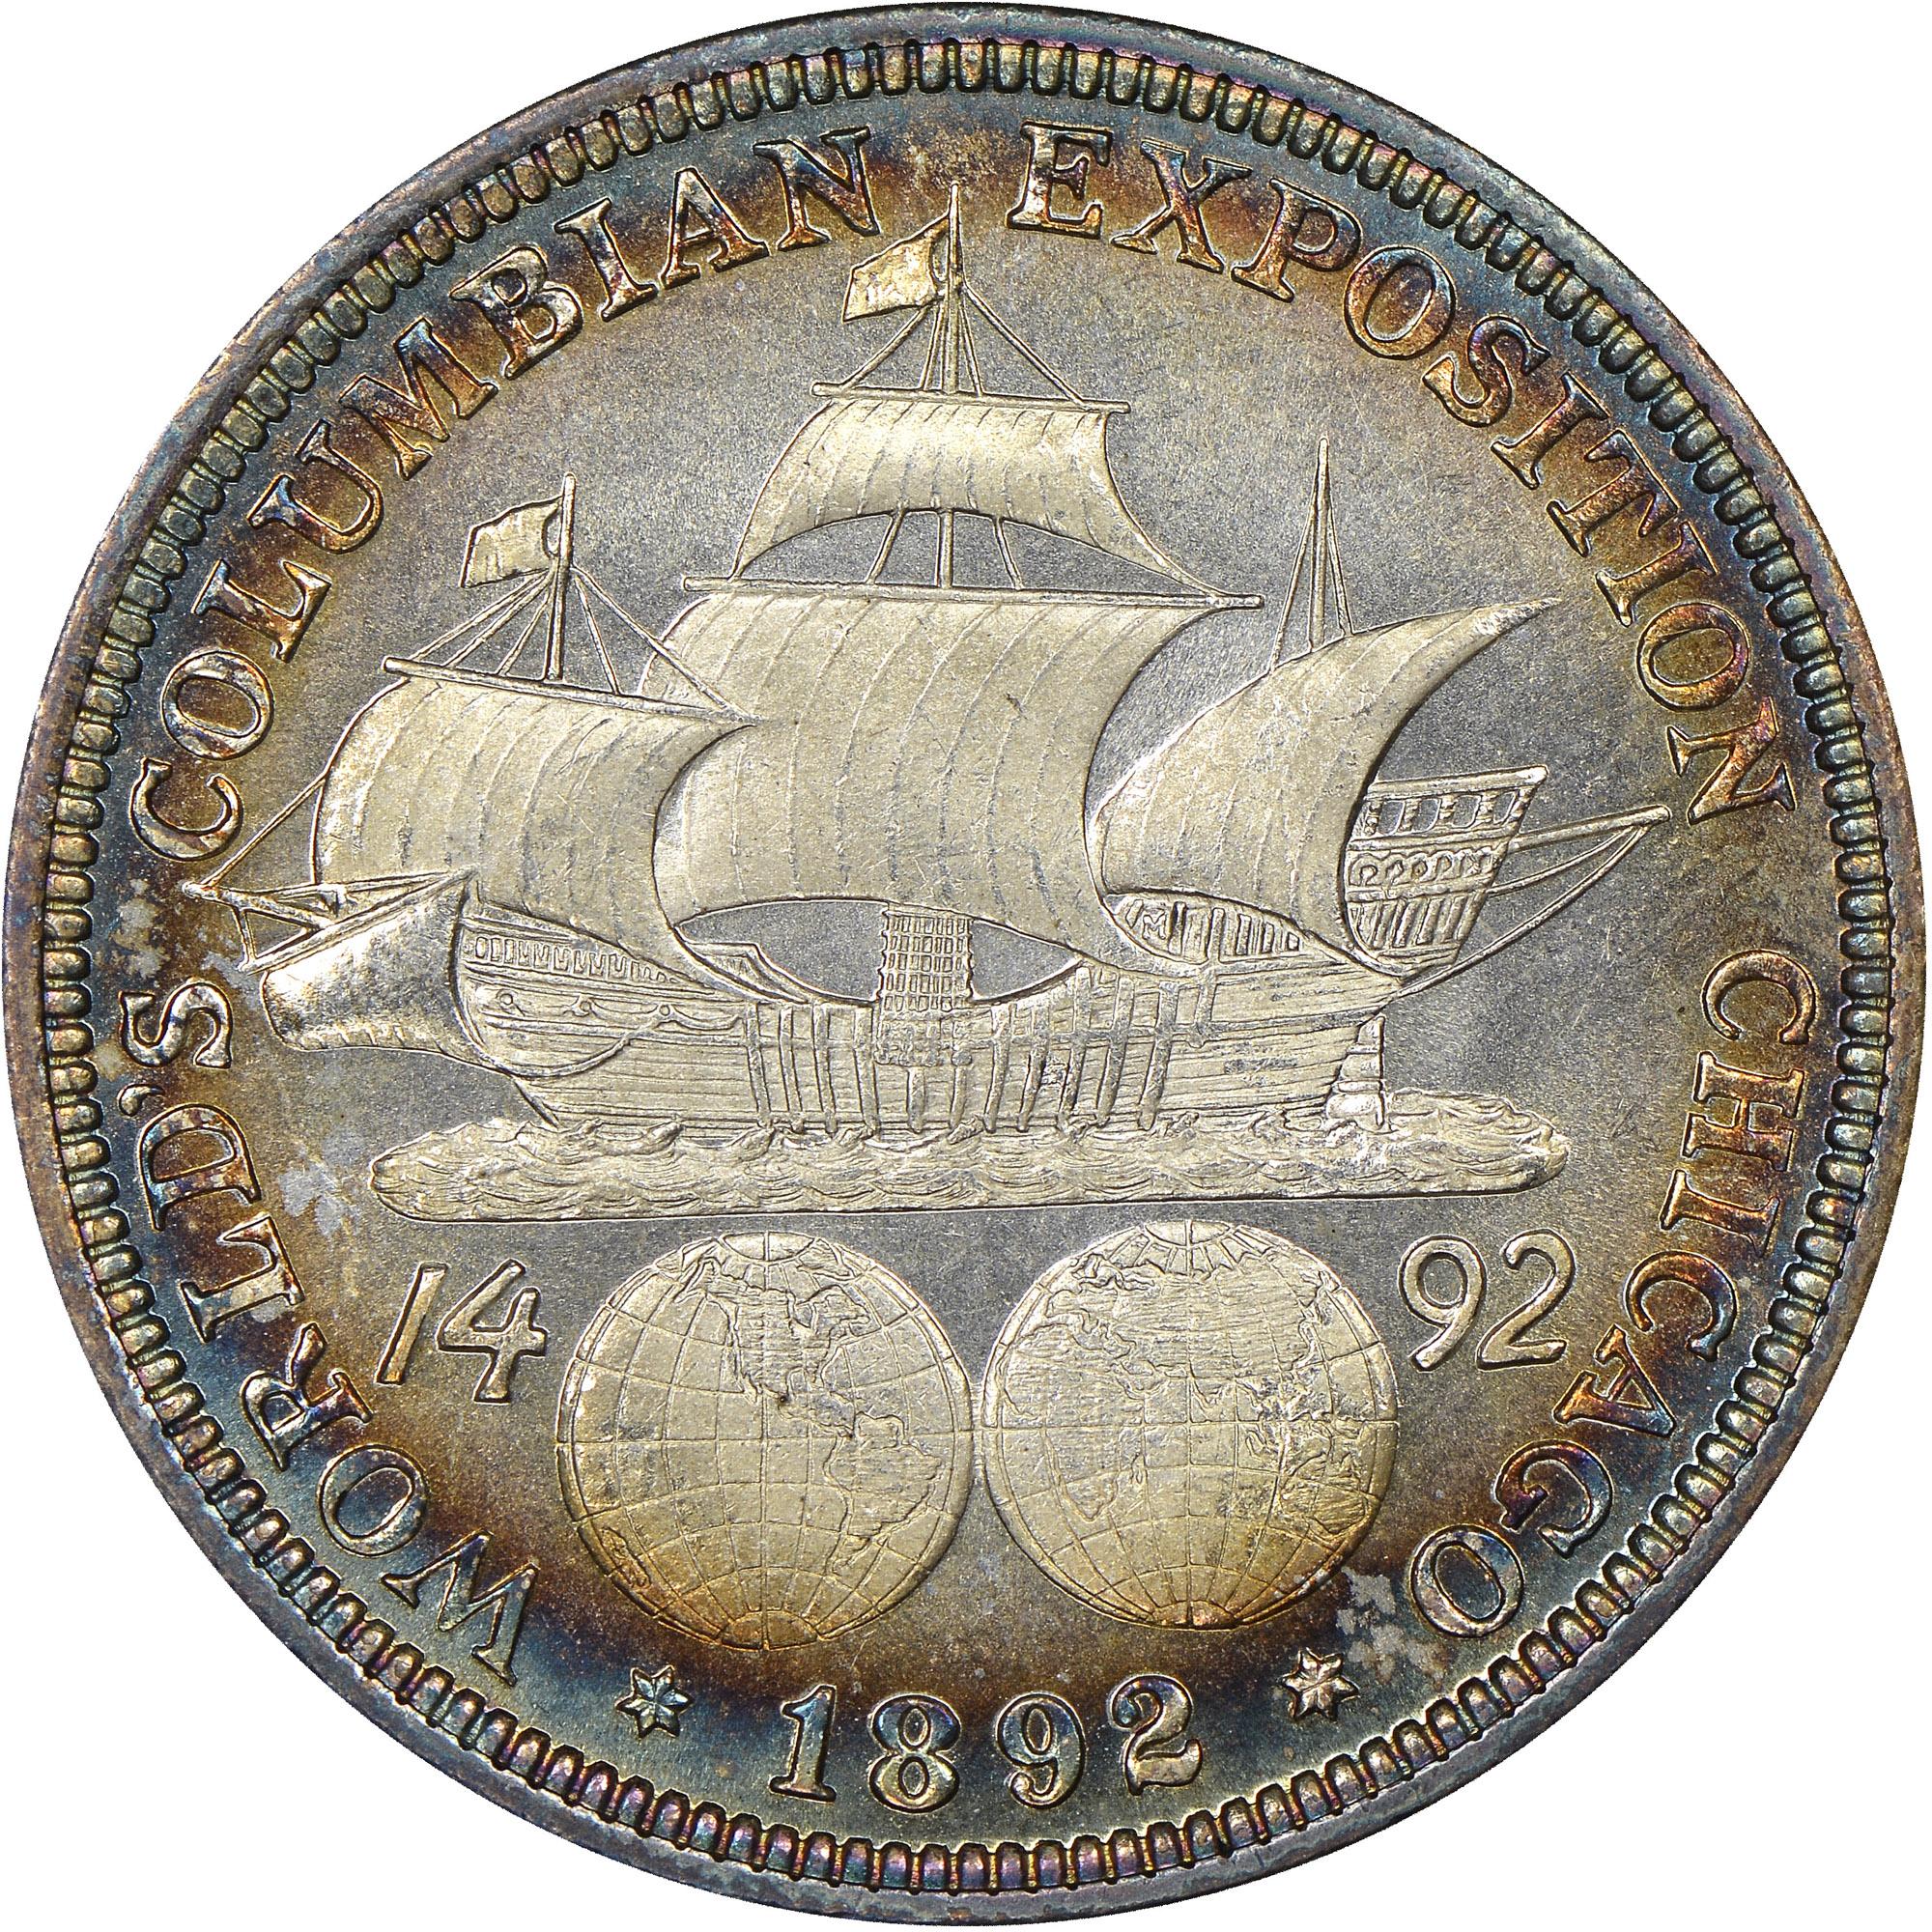 HIGH GRADE 1893 COLUMBIAN HALF DOLLAR SILVER COMMEMORATIVE NICE COIN